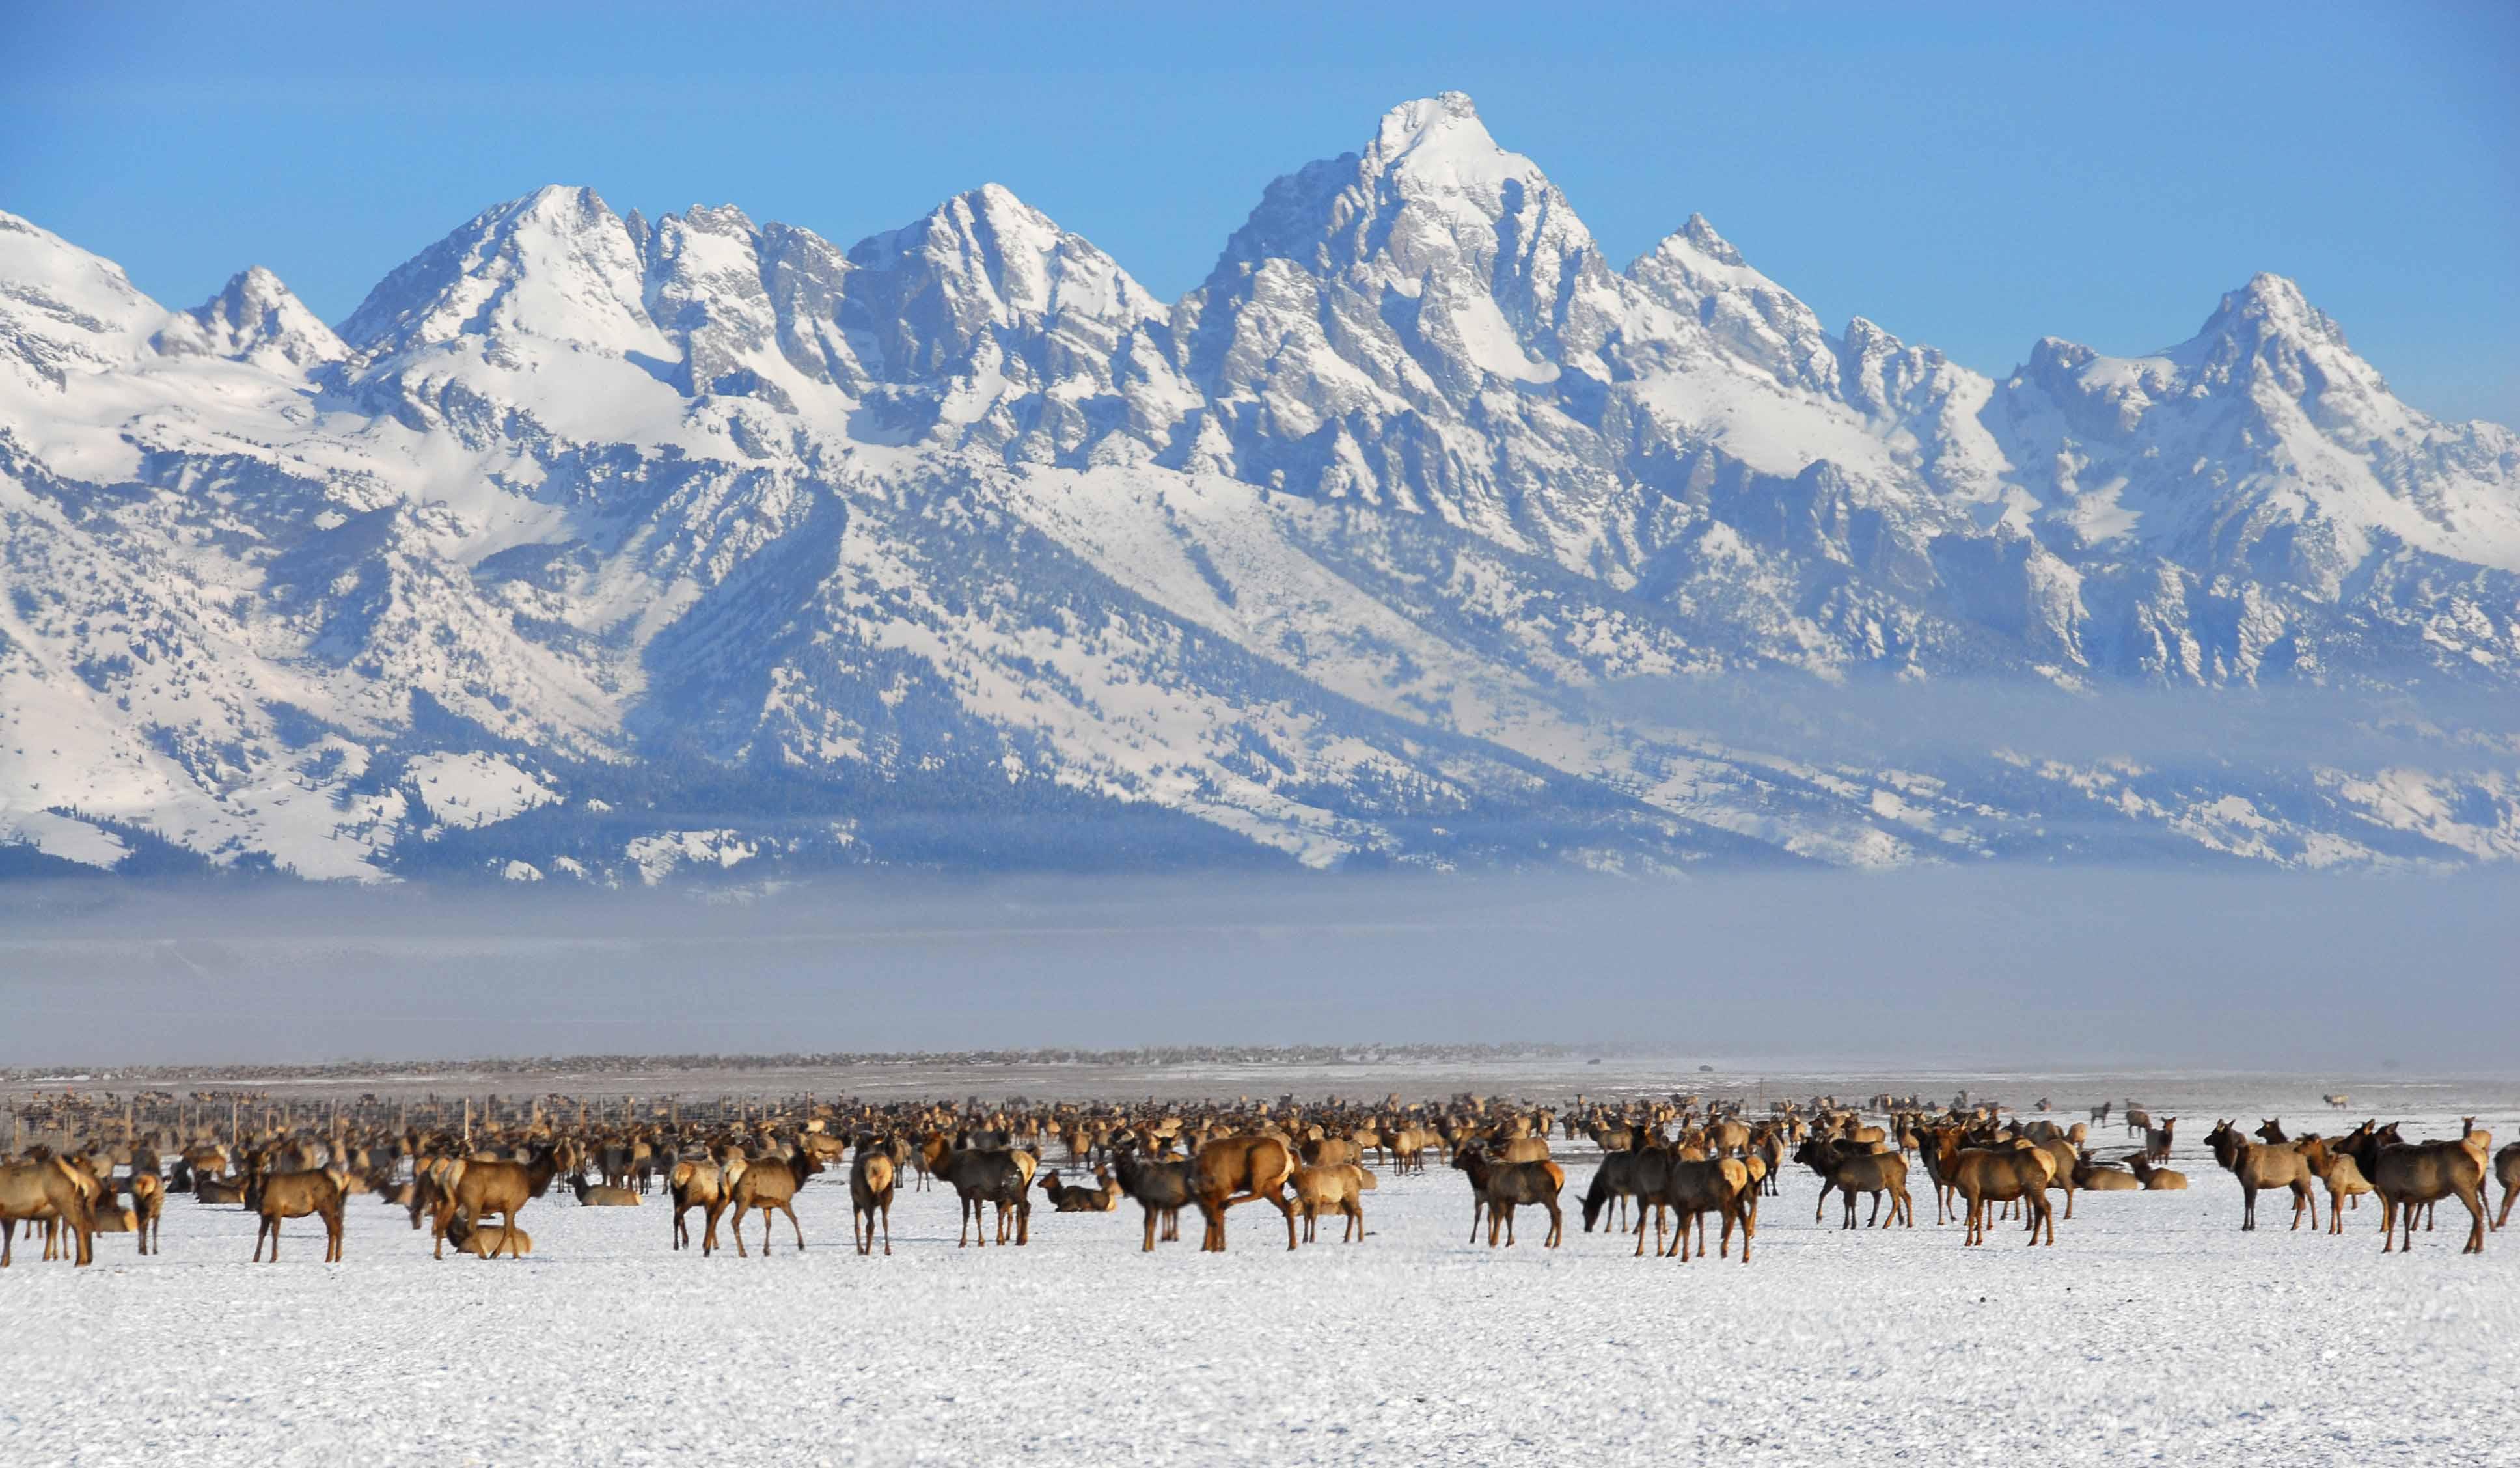 National Elk Refuge - Elk migration herd in winter